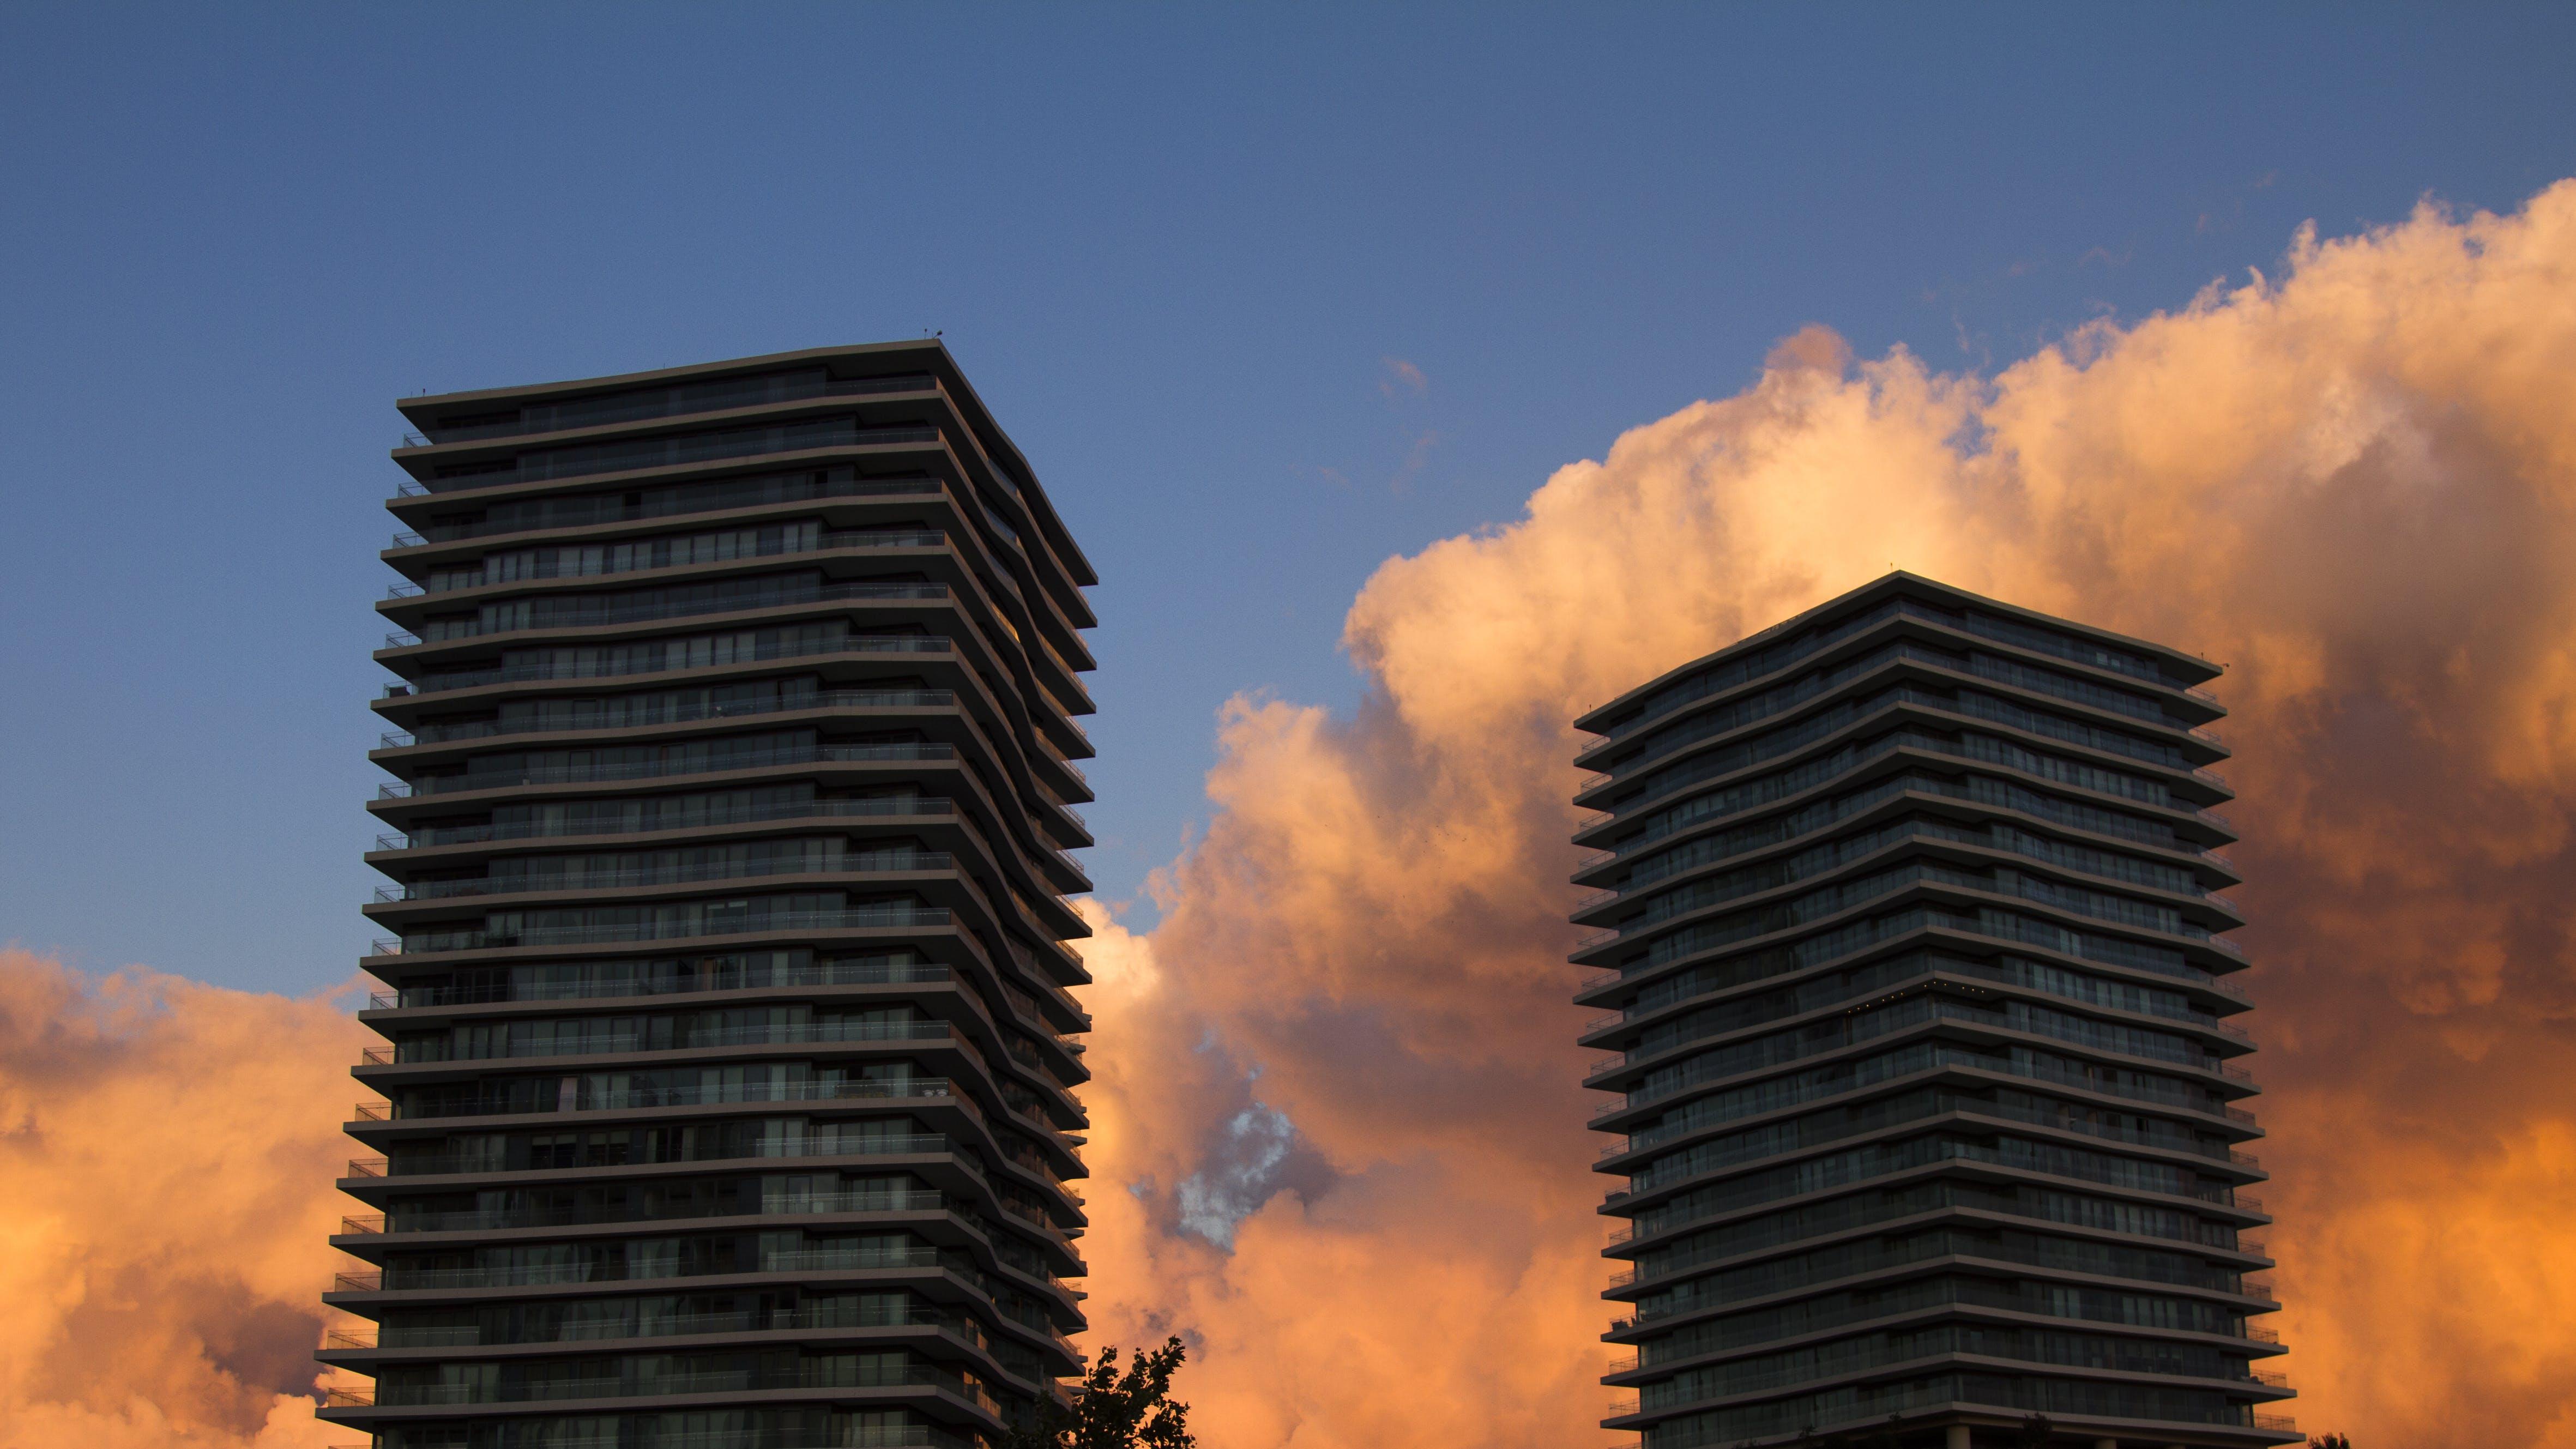 Free stock photo of blue sky, buildings, red sky, sky